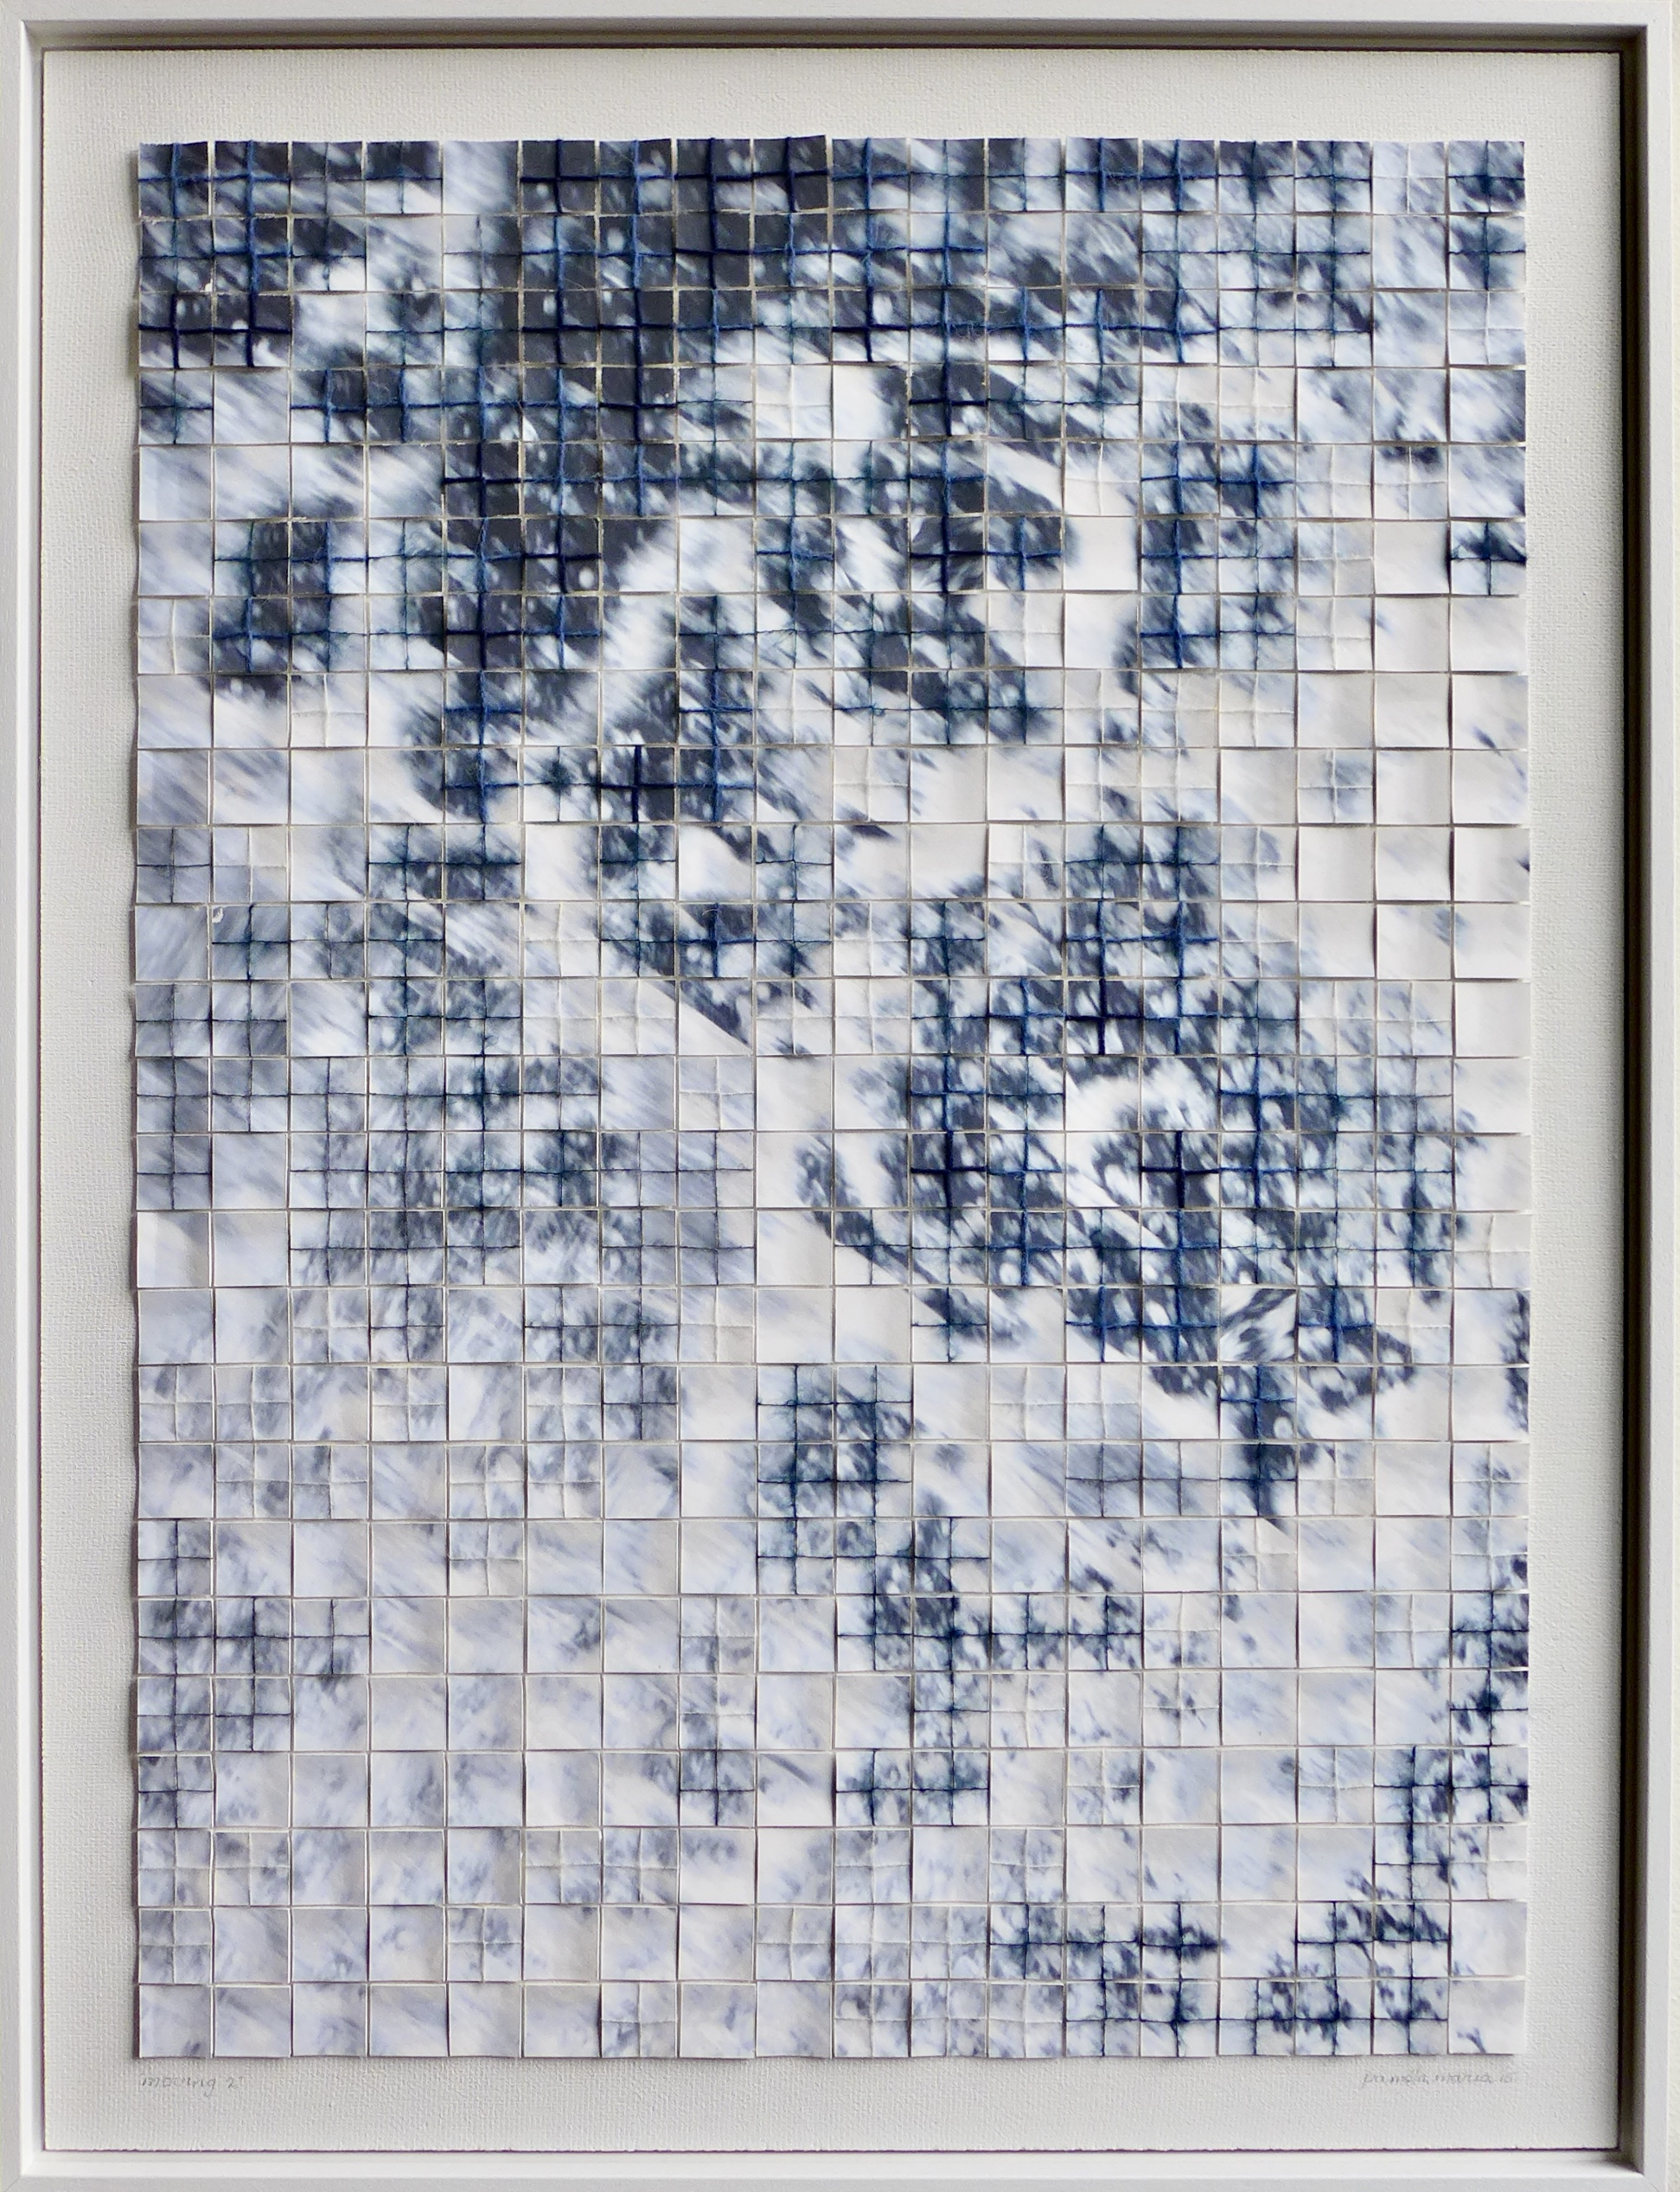 2015, 80x60cm, wit houten lijst, foto opspattend boegwater op karton, divers garen wol en katoen, lijm, canvas